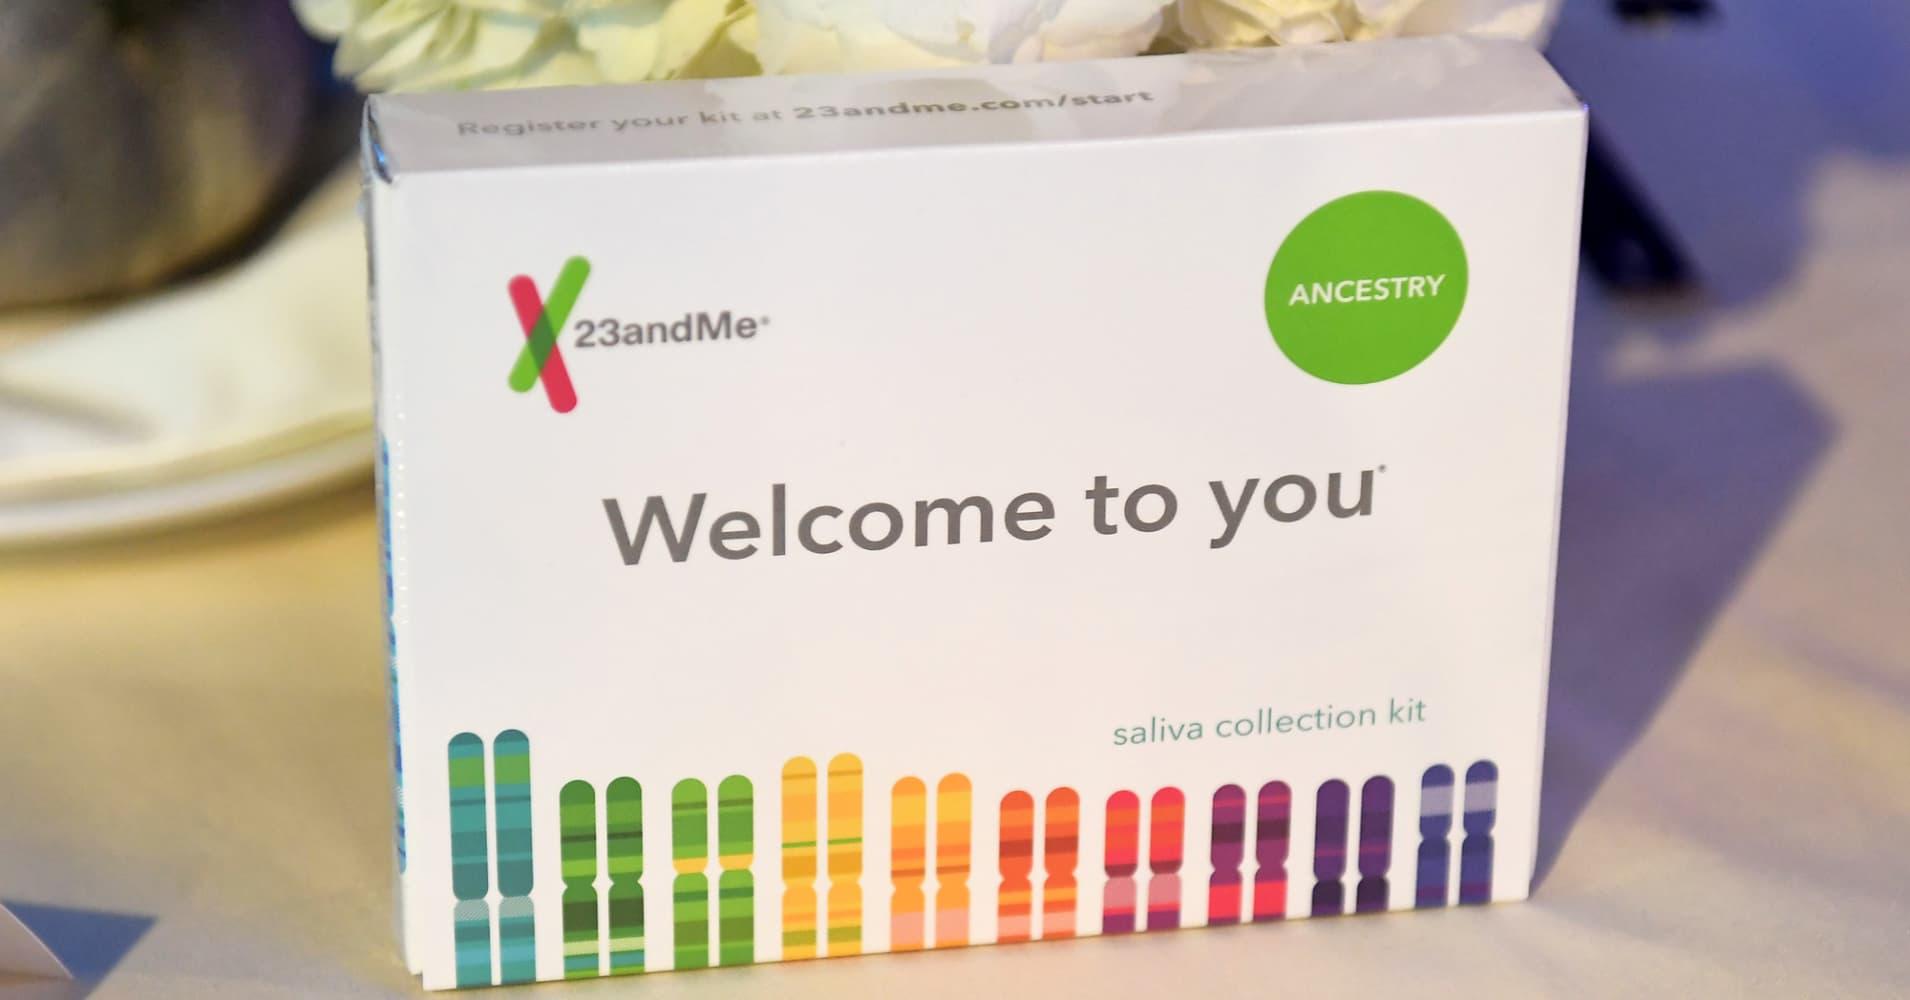 23andMe to offer diabetes genetic testing